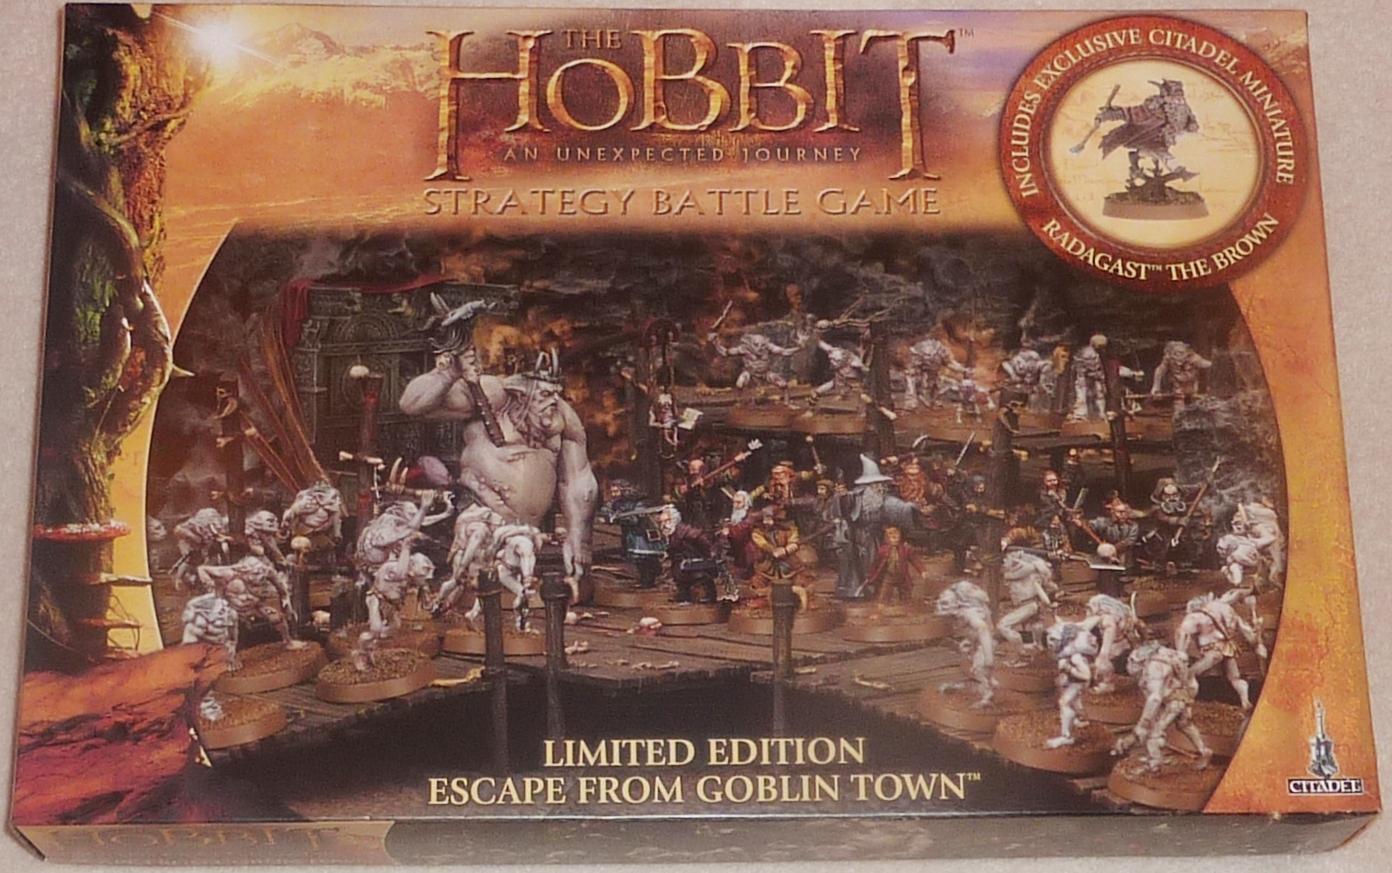 Legatus Wargames Armies The Hobbit Escape From Goblin Town